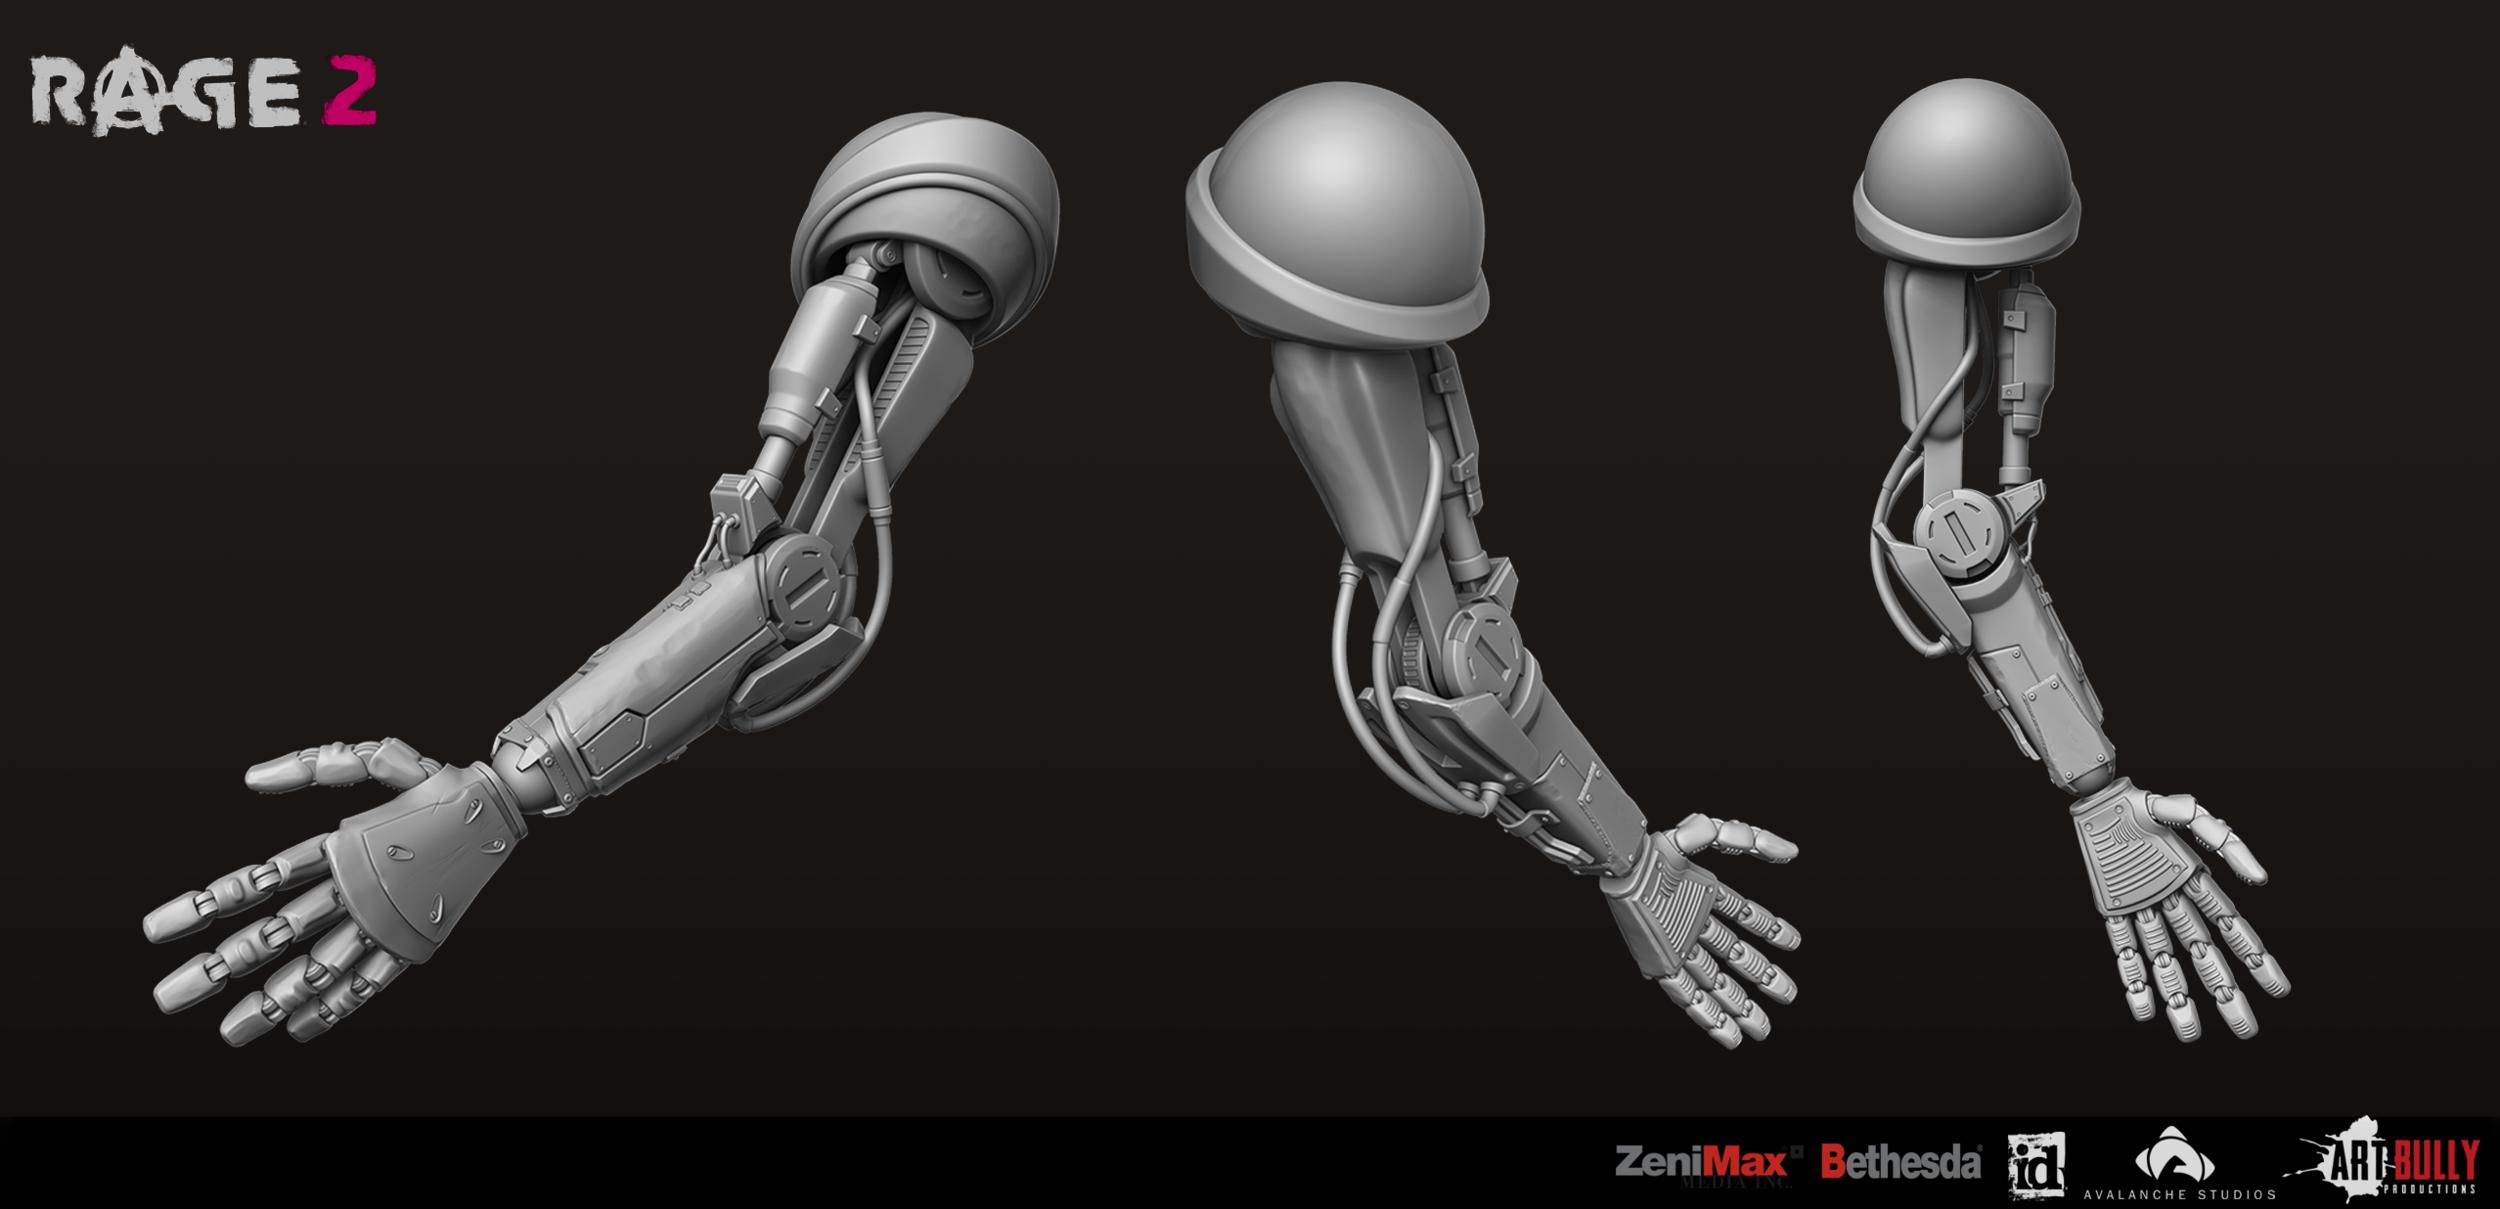 Goon_Shotgun_Arm_Bionicle_01_render.png